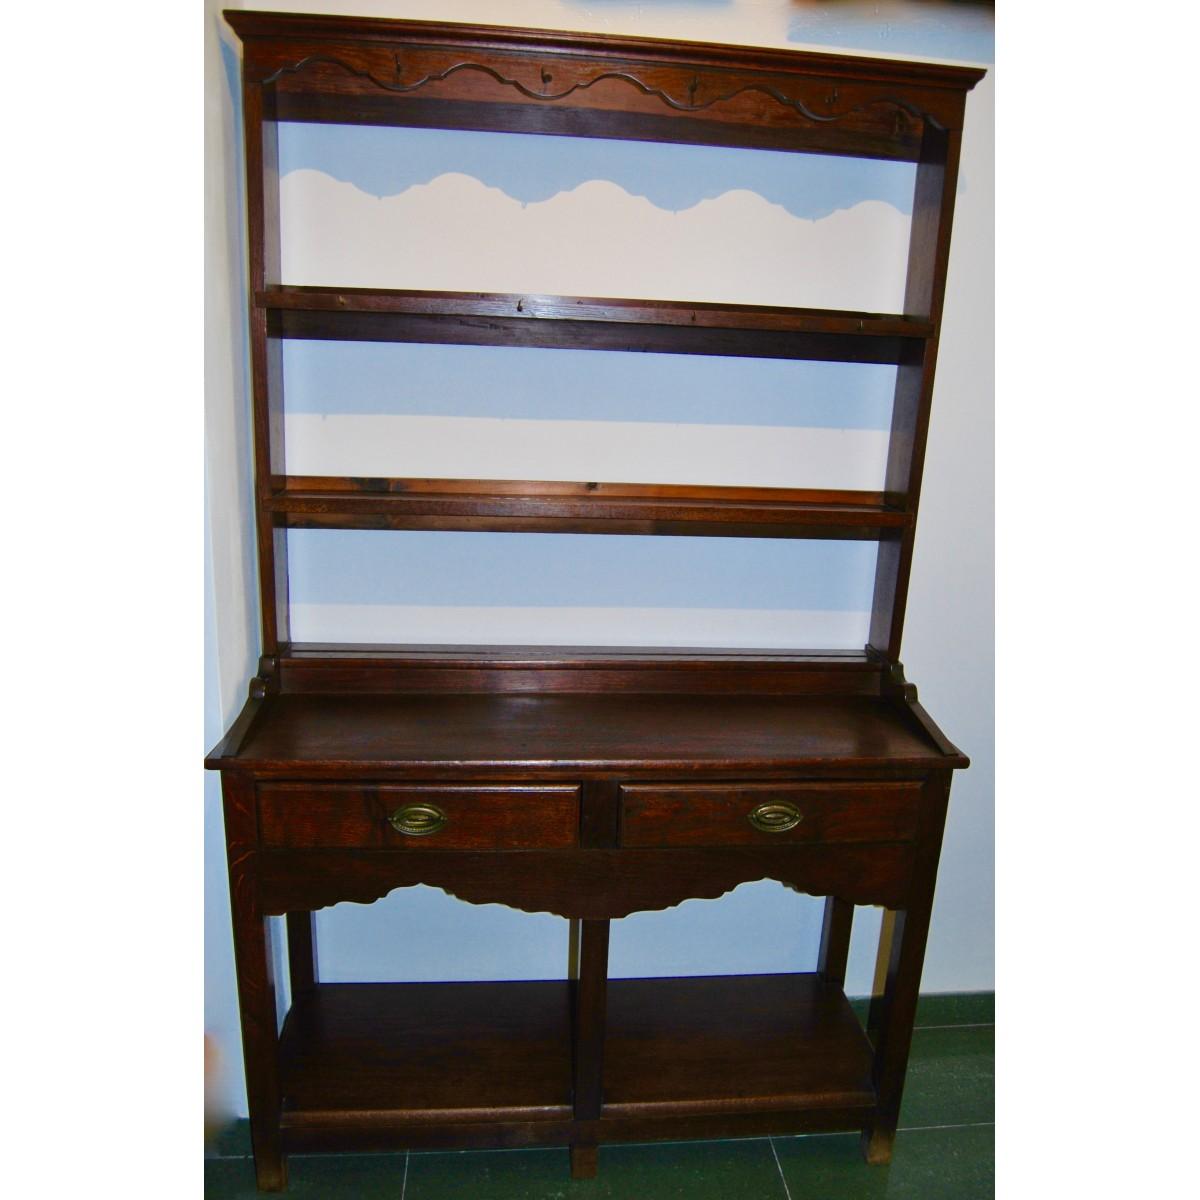 English plate rack furniture, 20th